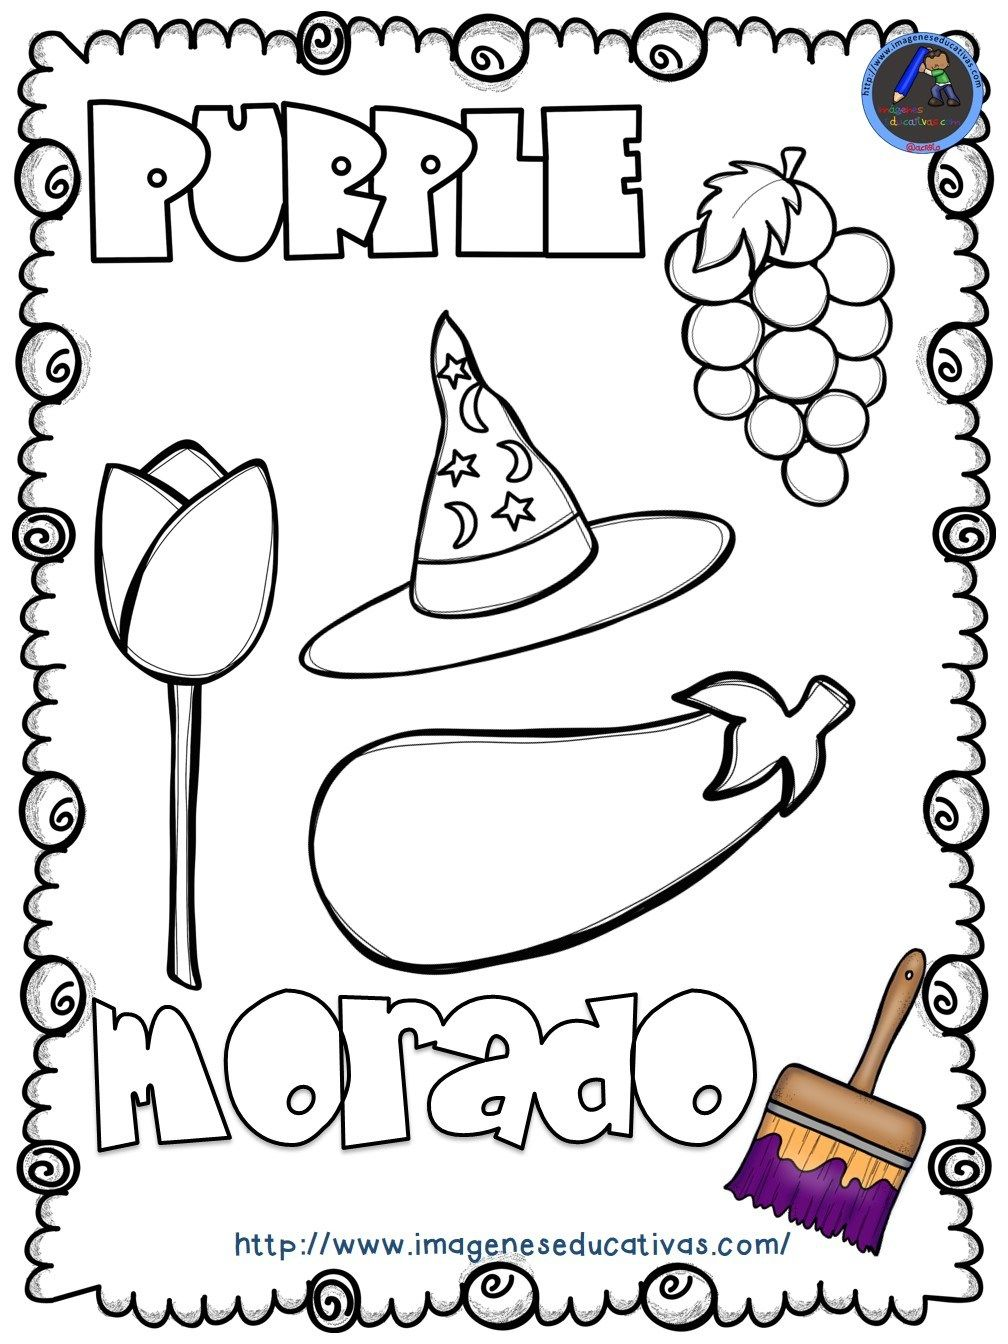 Pin von SANDRA ACOSTA auf educación | Pinterest | Kind